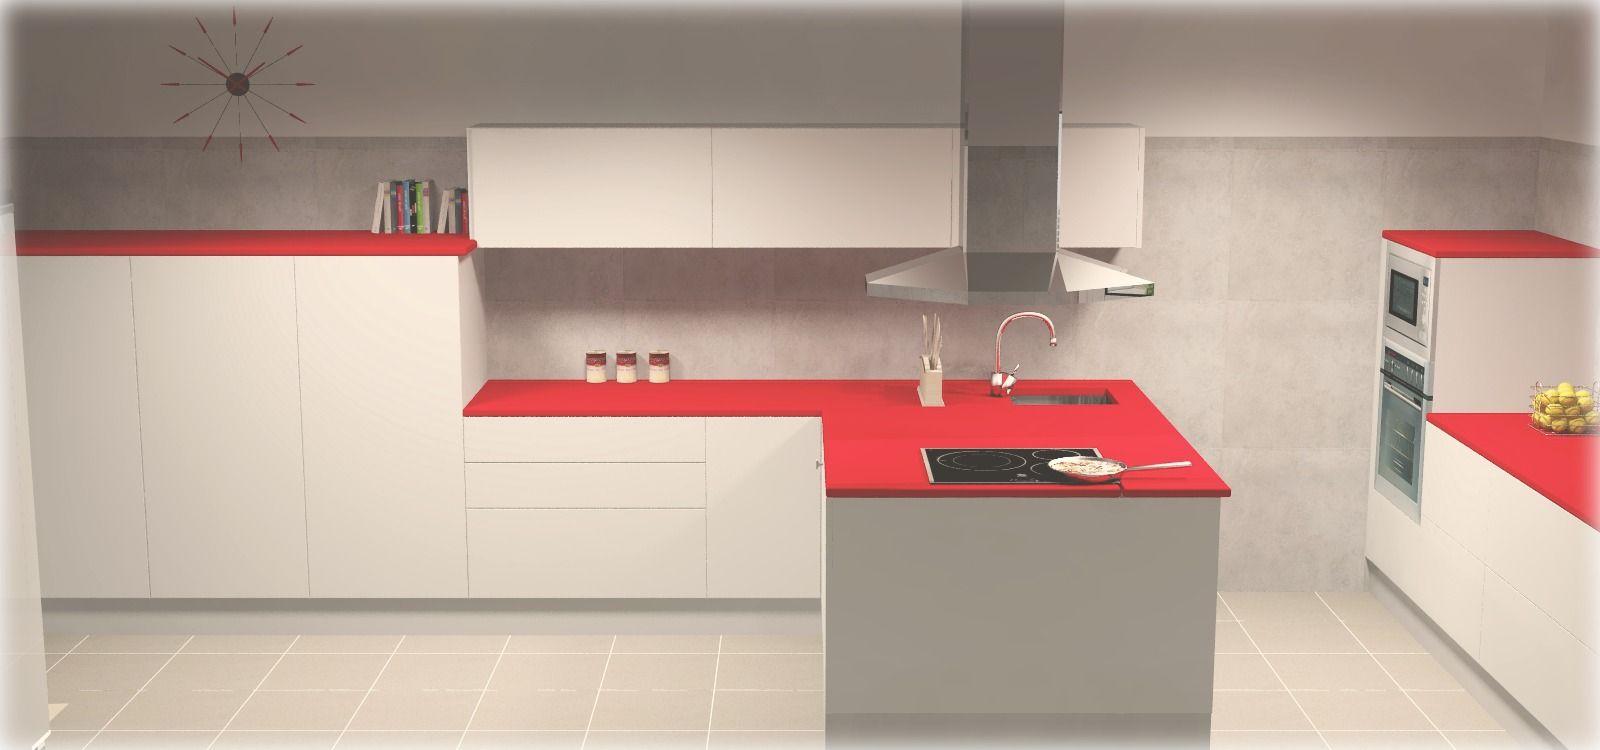 cocina en blanco alto brillo sin tirador encimera roja con pennsula